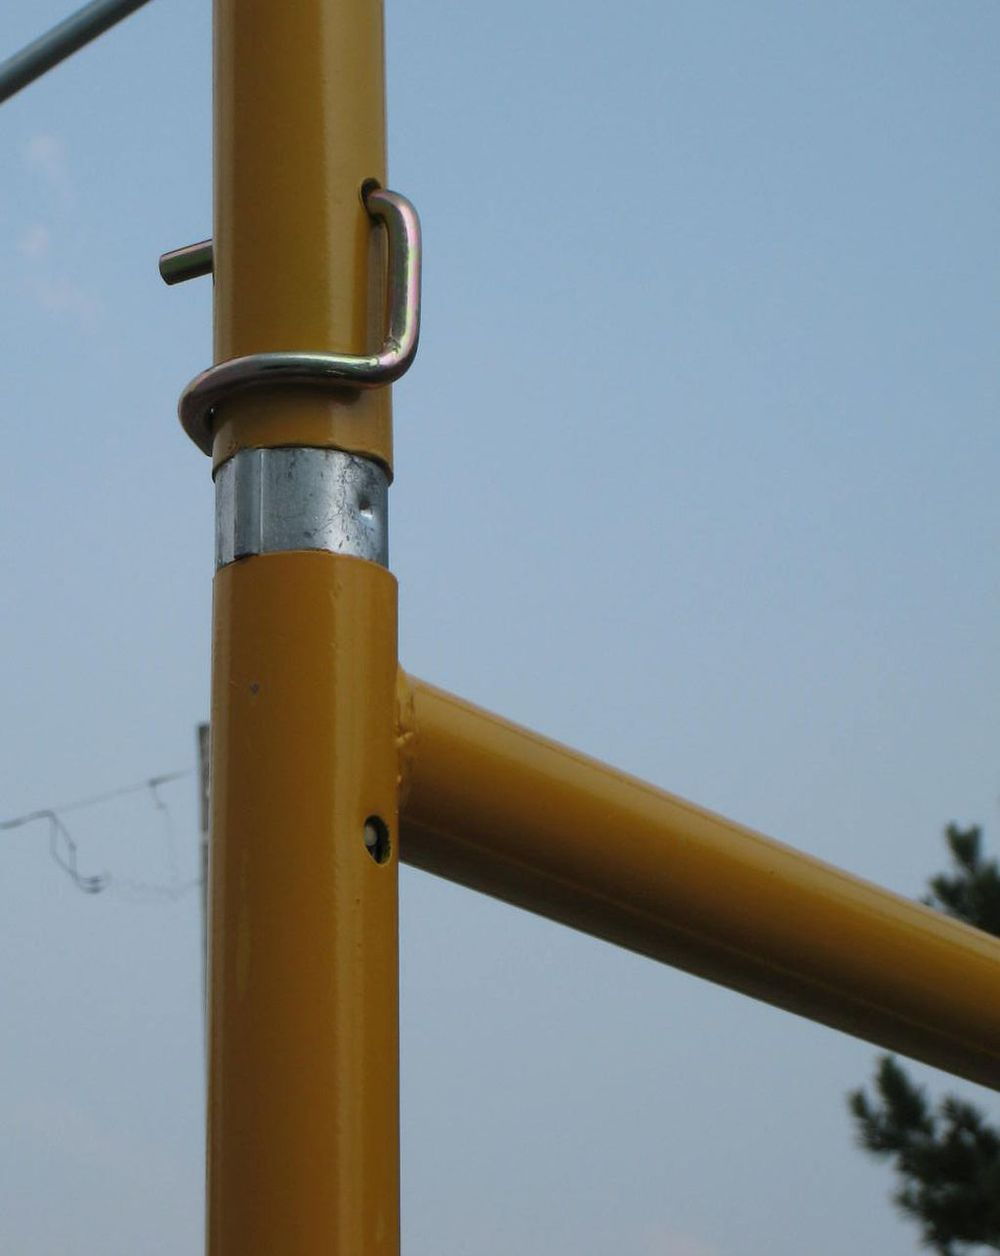 Scaffolding Snap Pin : Scaffolding frame galvanized steel lock pin scaffold